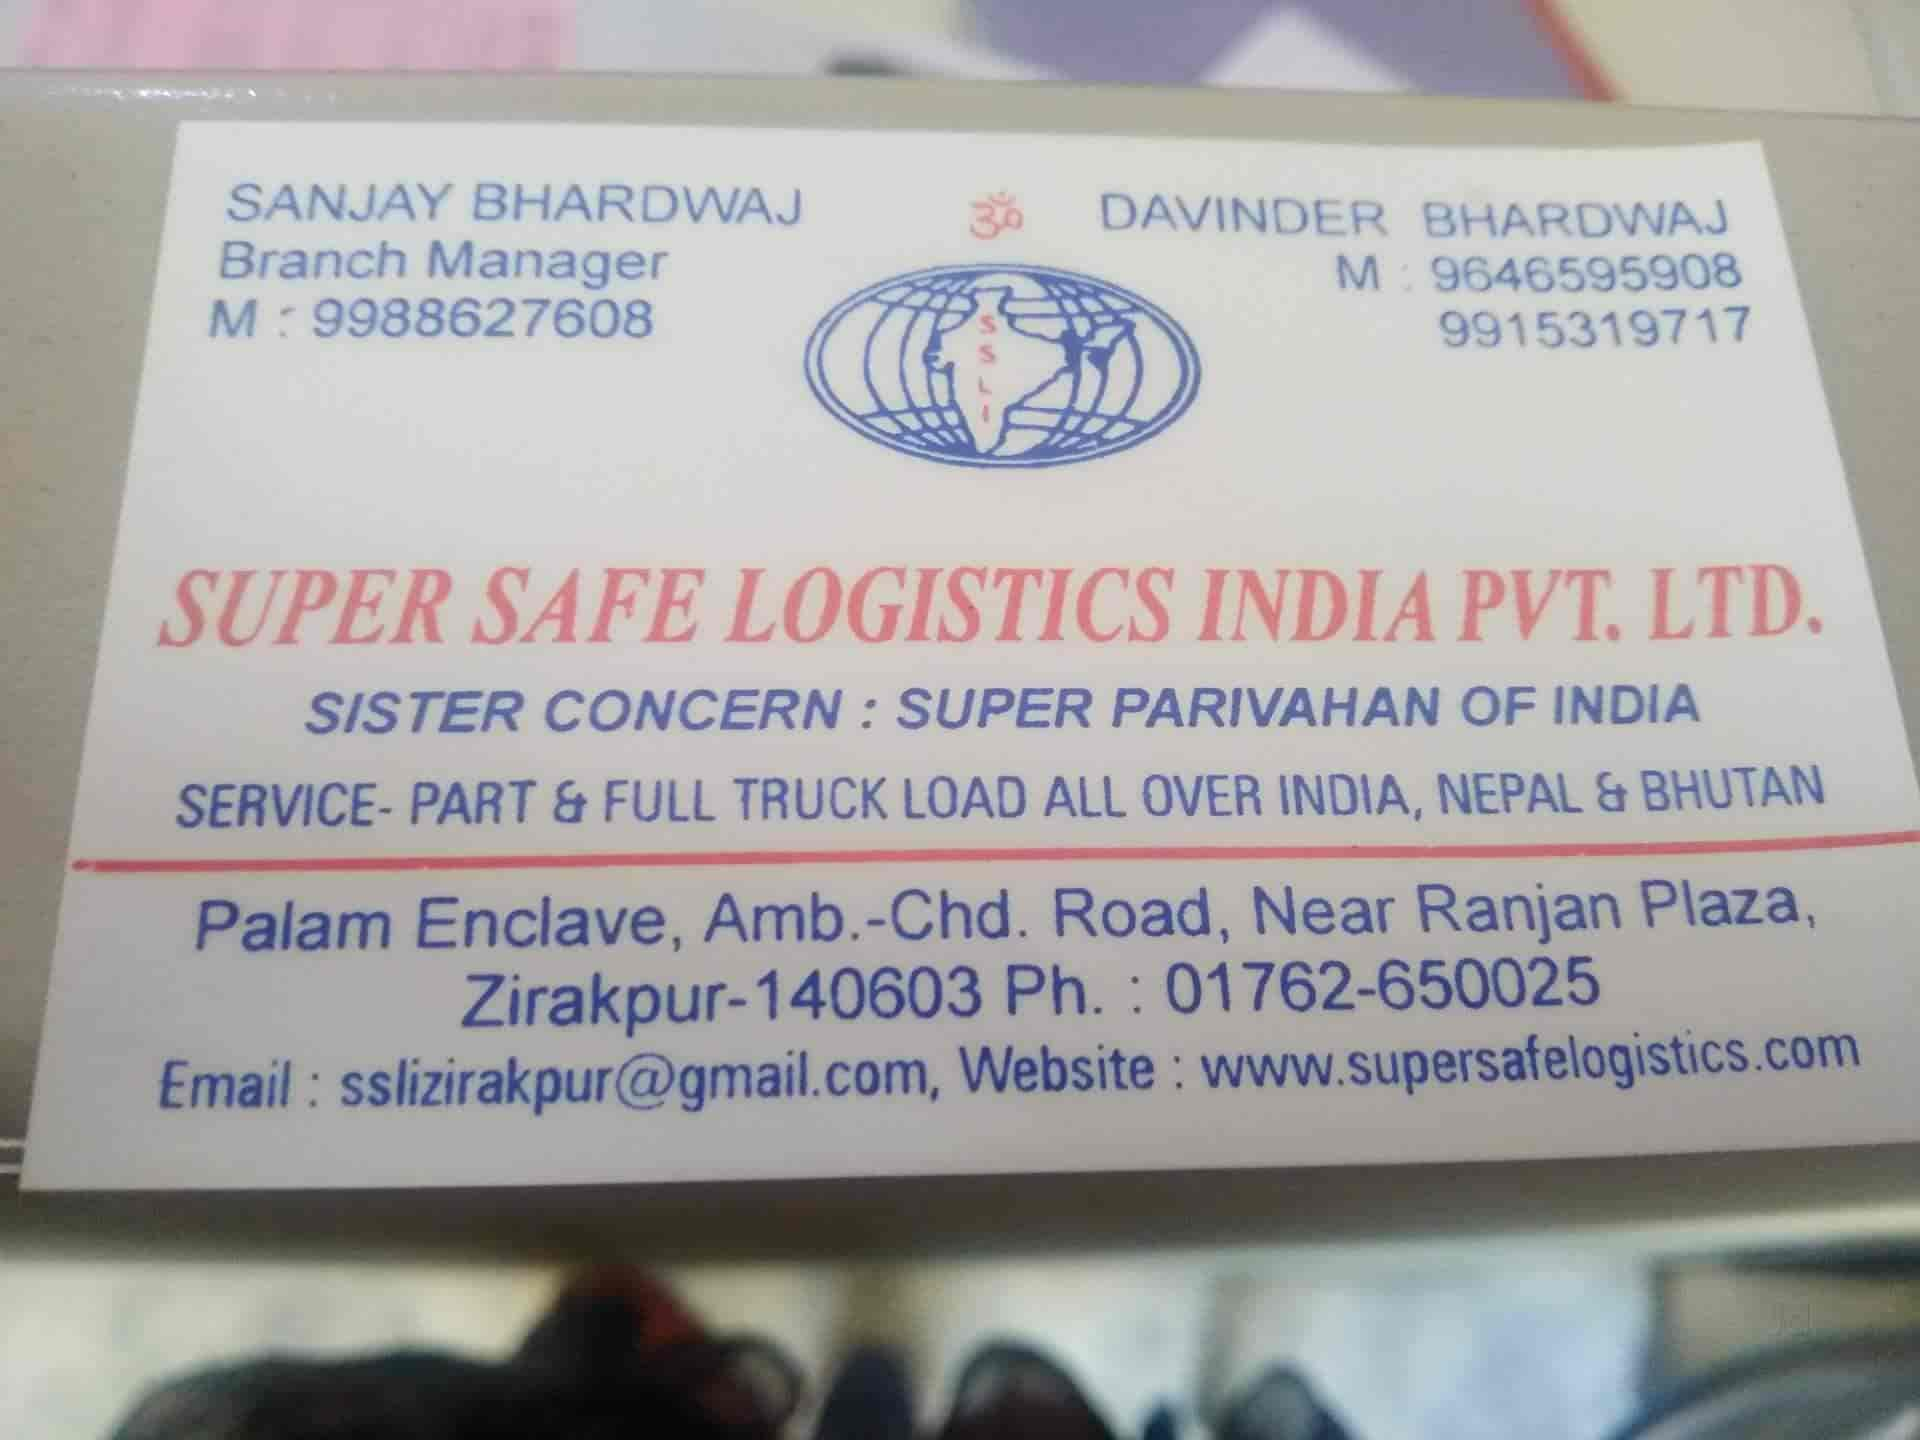 Super Safe Logistics India Pvtltd Photos, Zirakpur HO